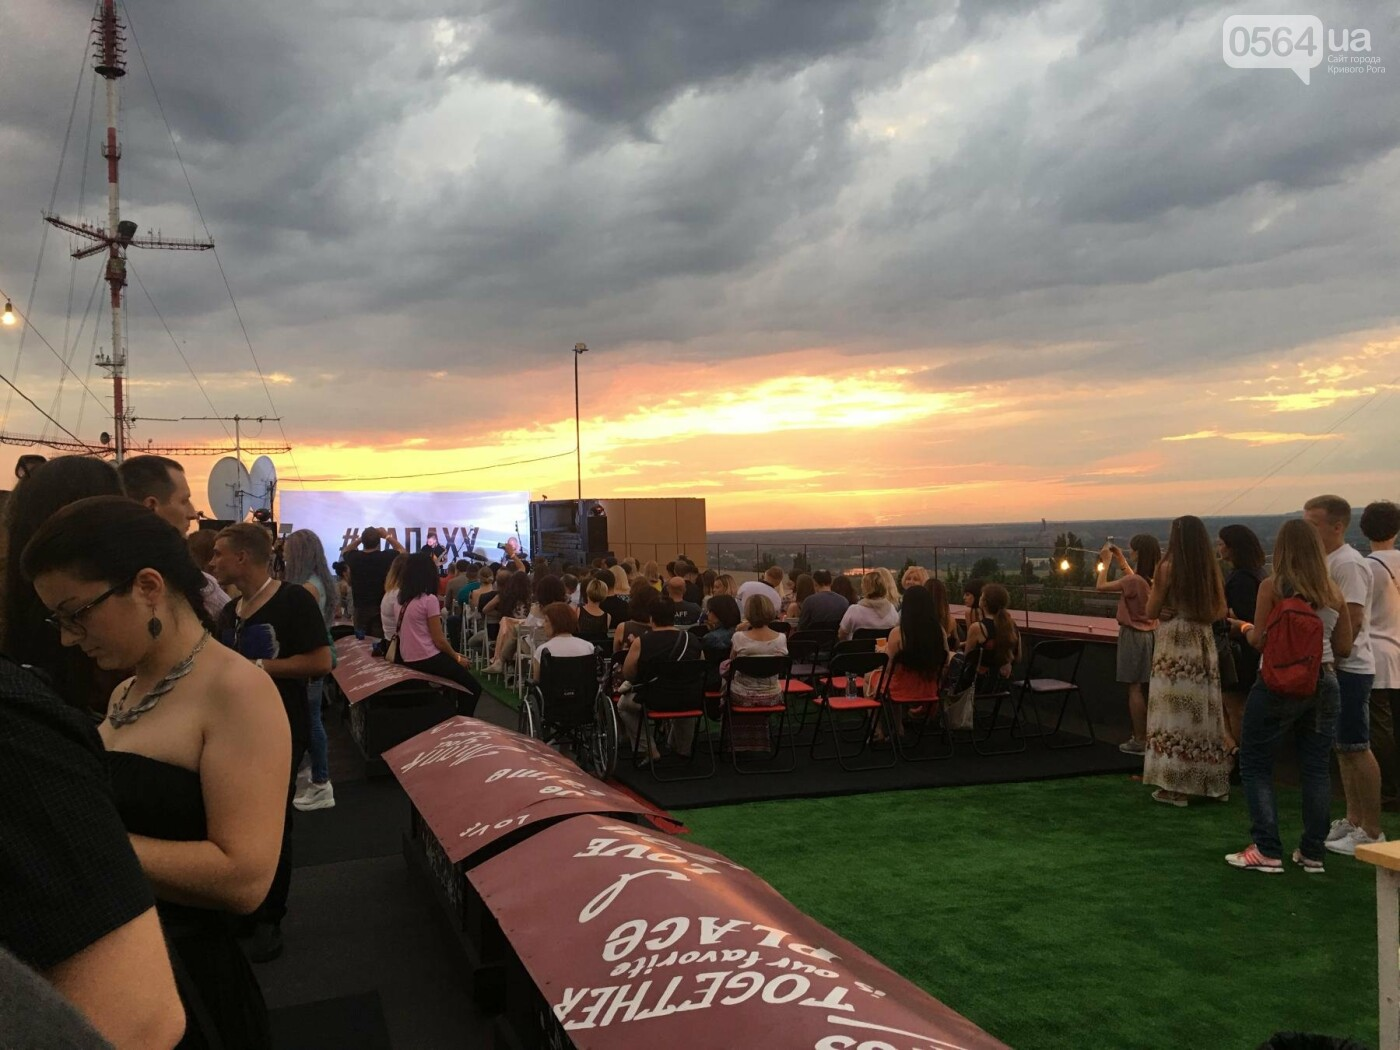 Сотни криворожан встречали закат на крыше отеля под мелодии джаза, - ФОТО, ВИДЕО, фото-42